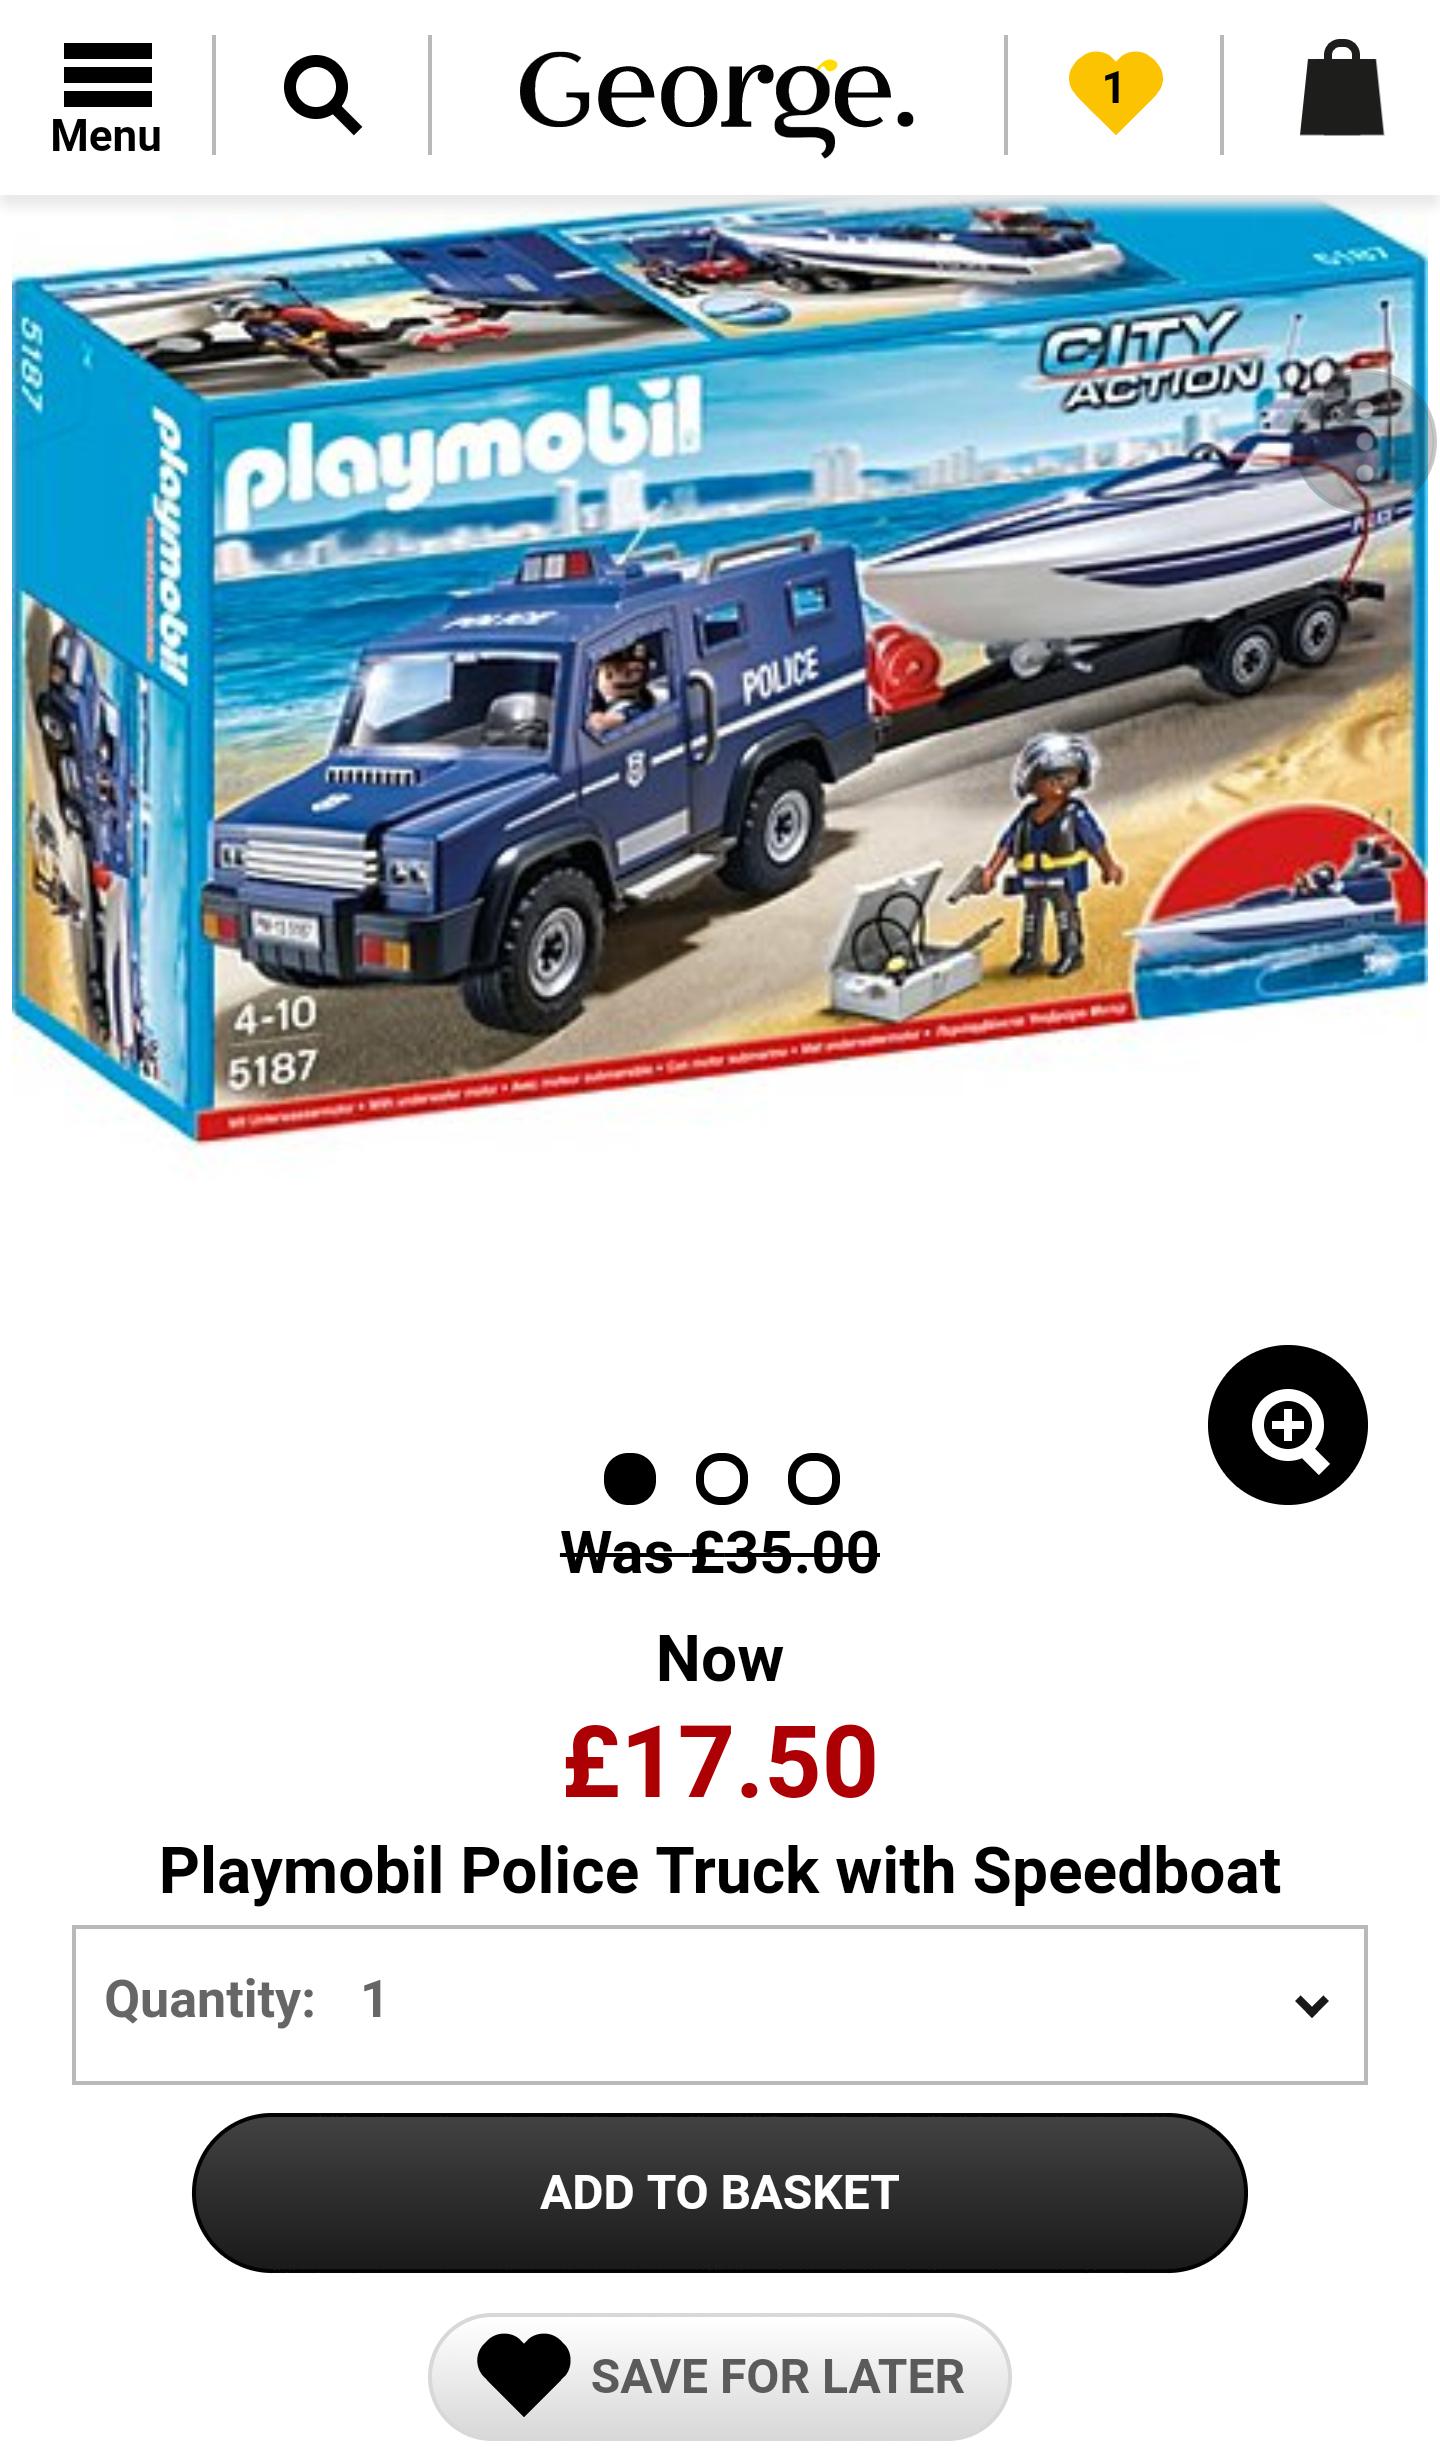 Playmobil police truck with speedboat - £17.50 @ Asda George (C&C)